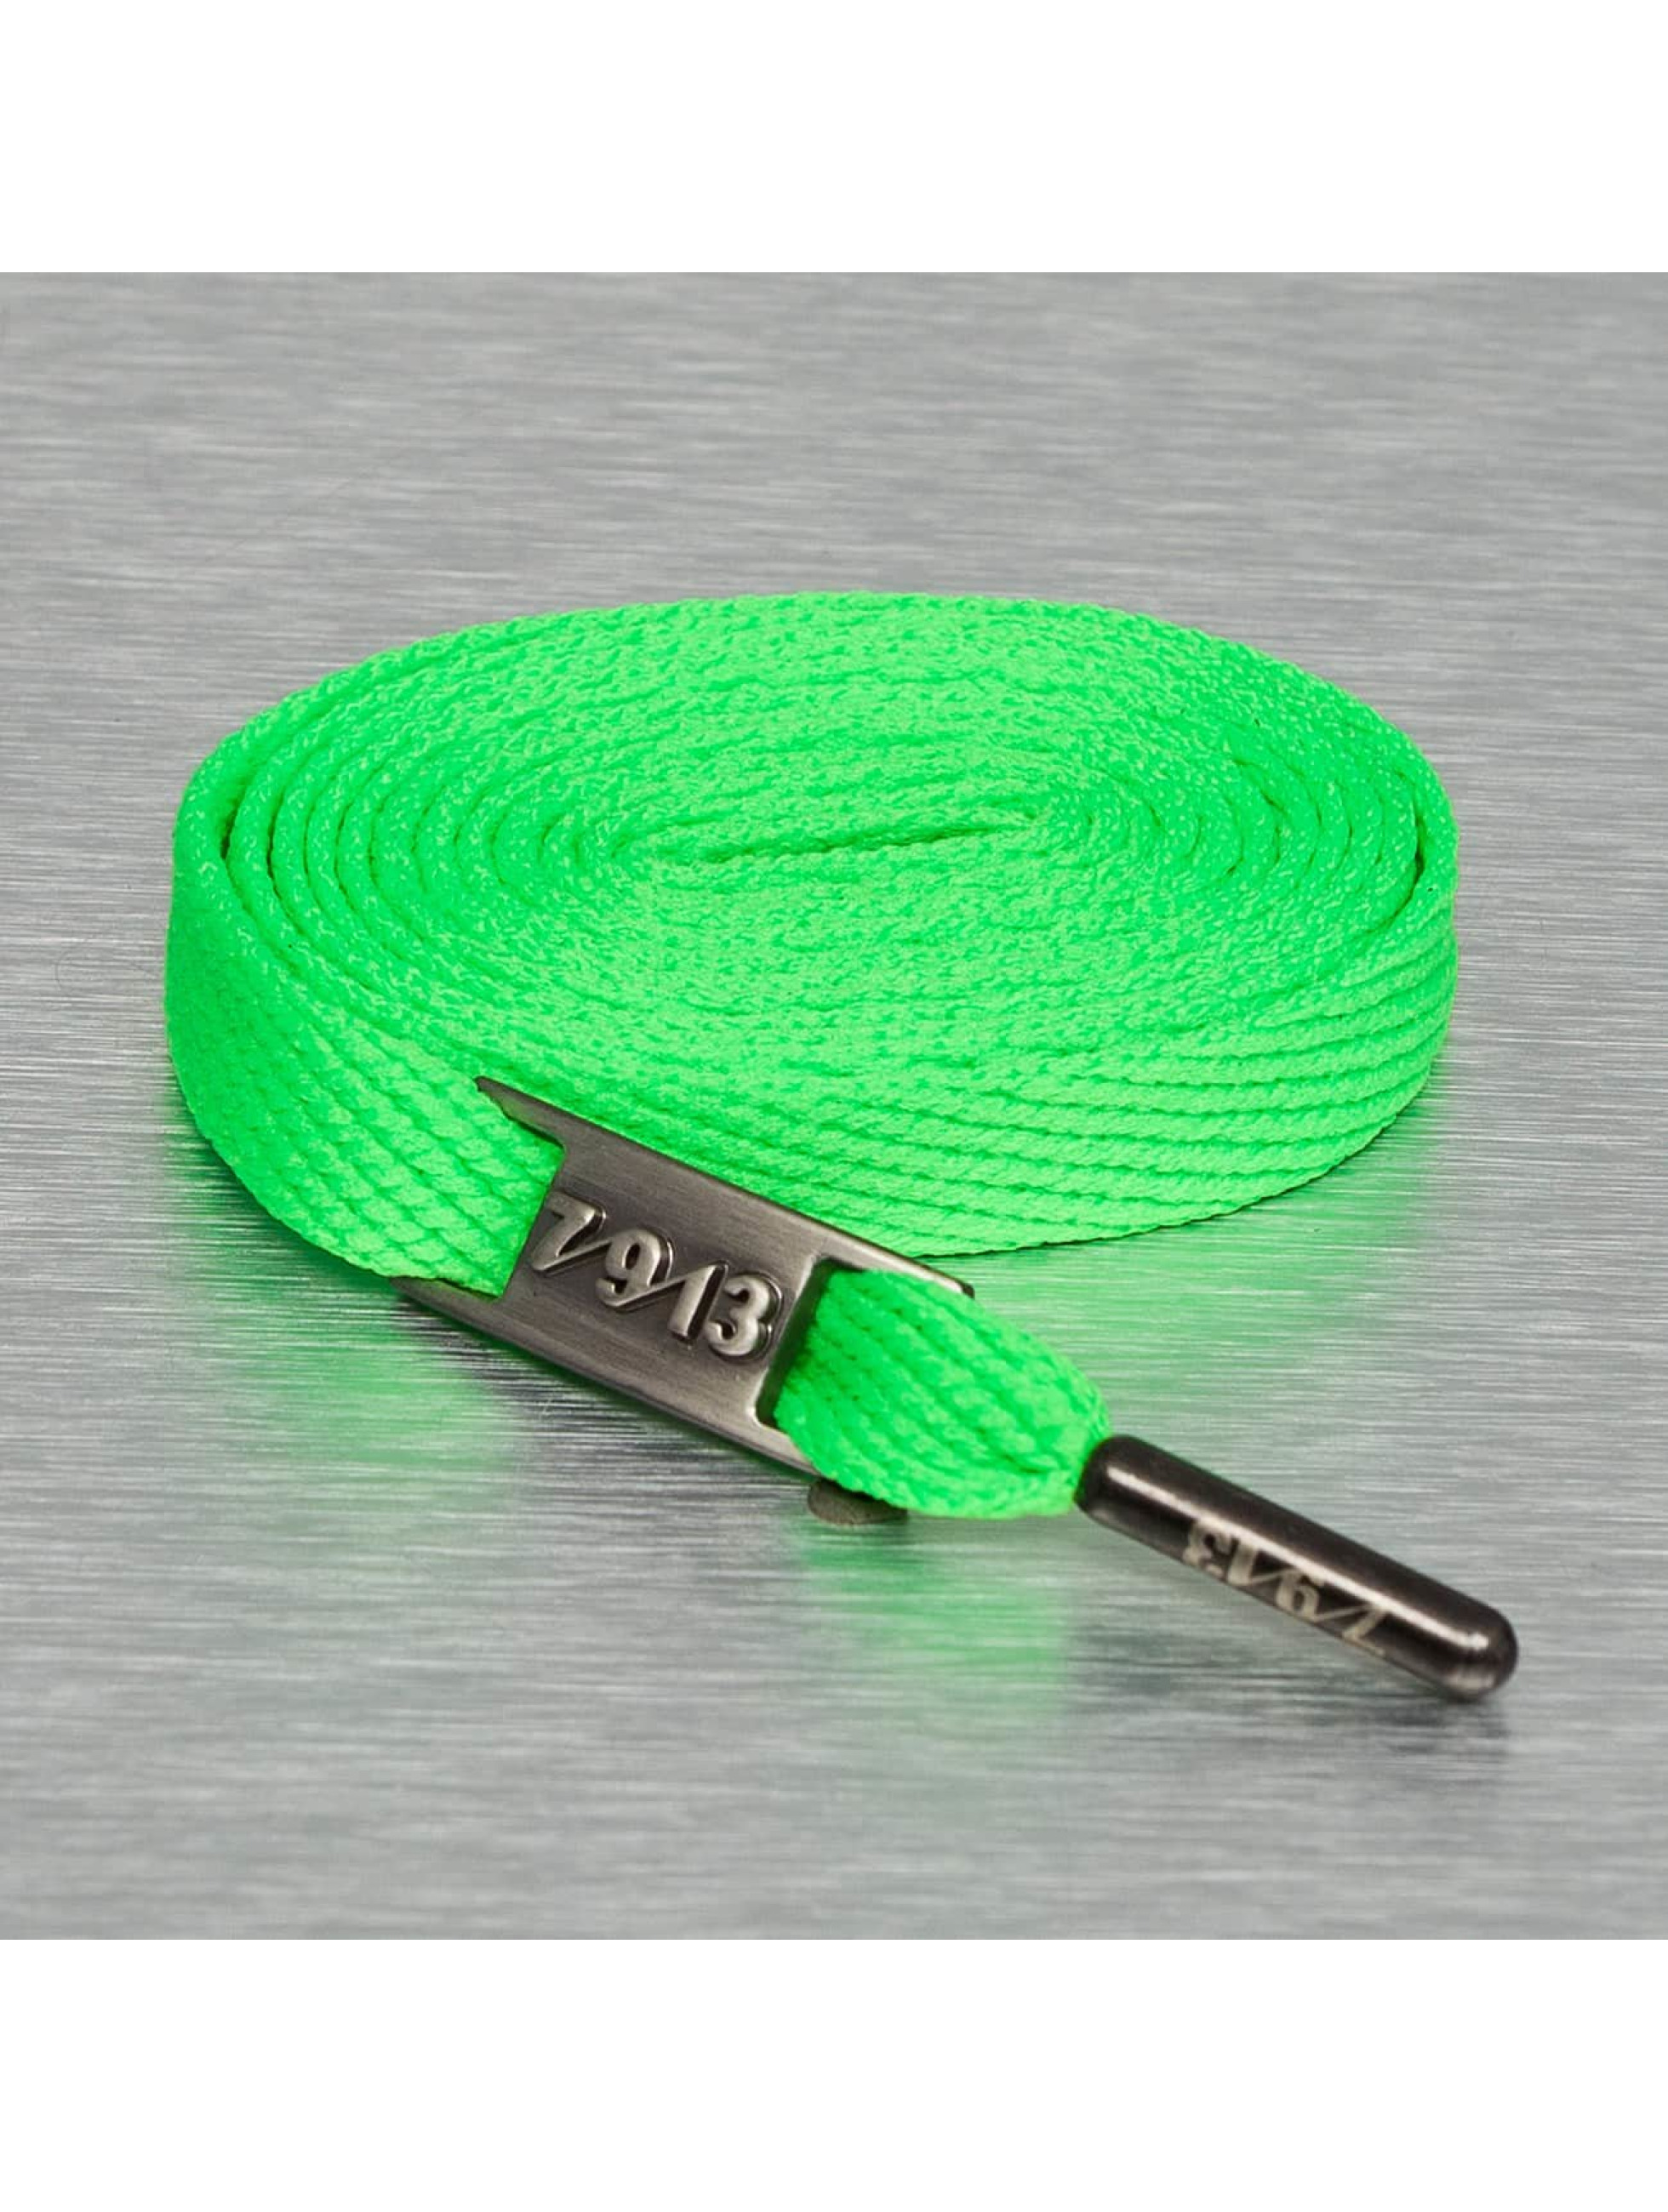 Seven Nine 13 Accesoria de zapatos Full Metal verde